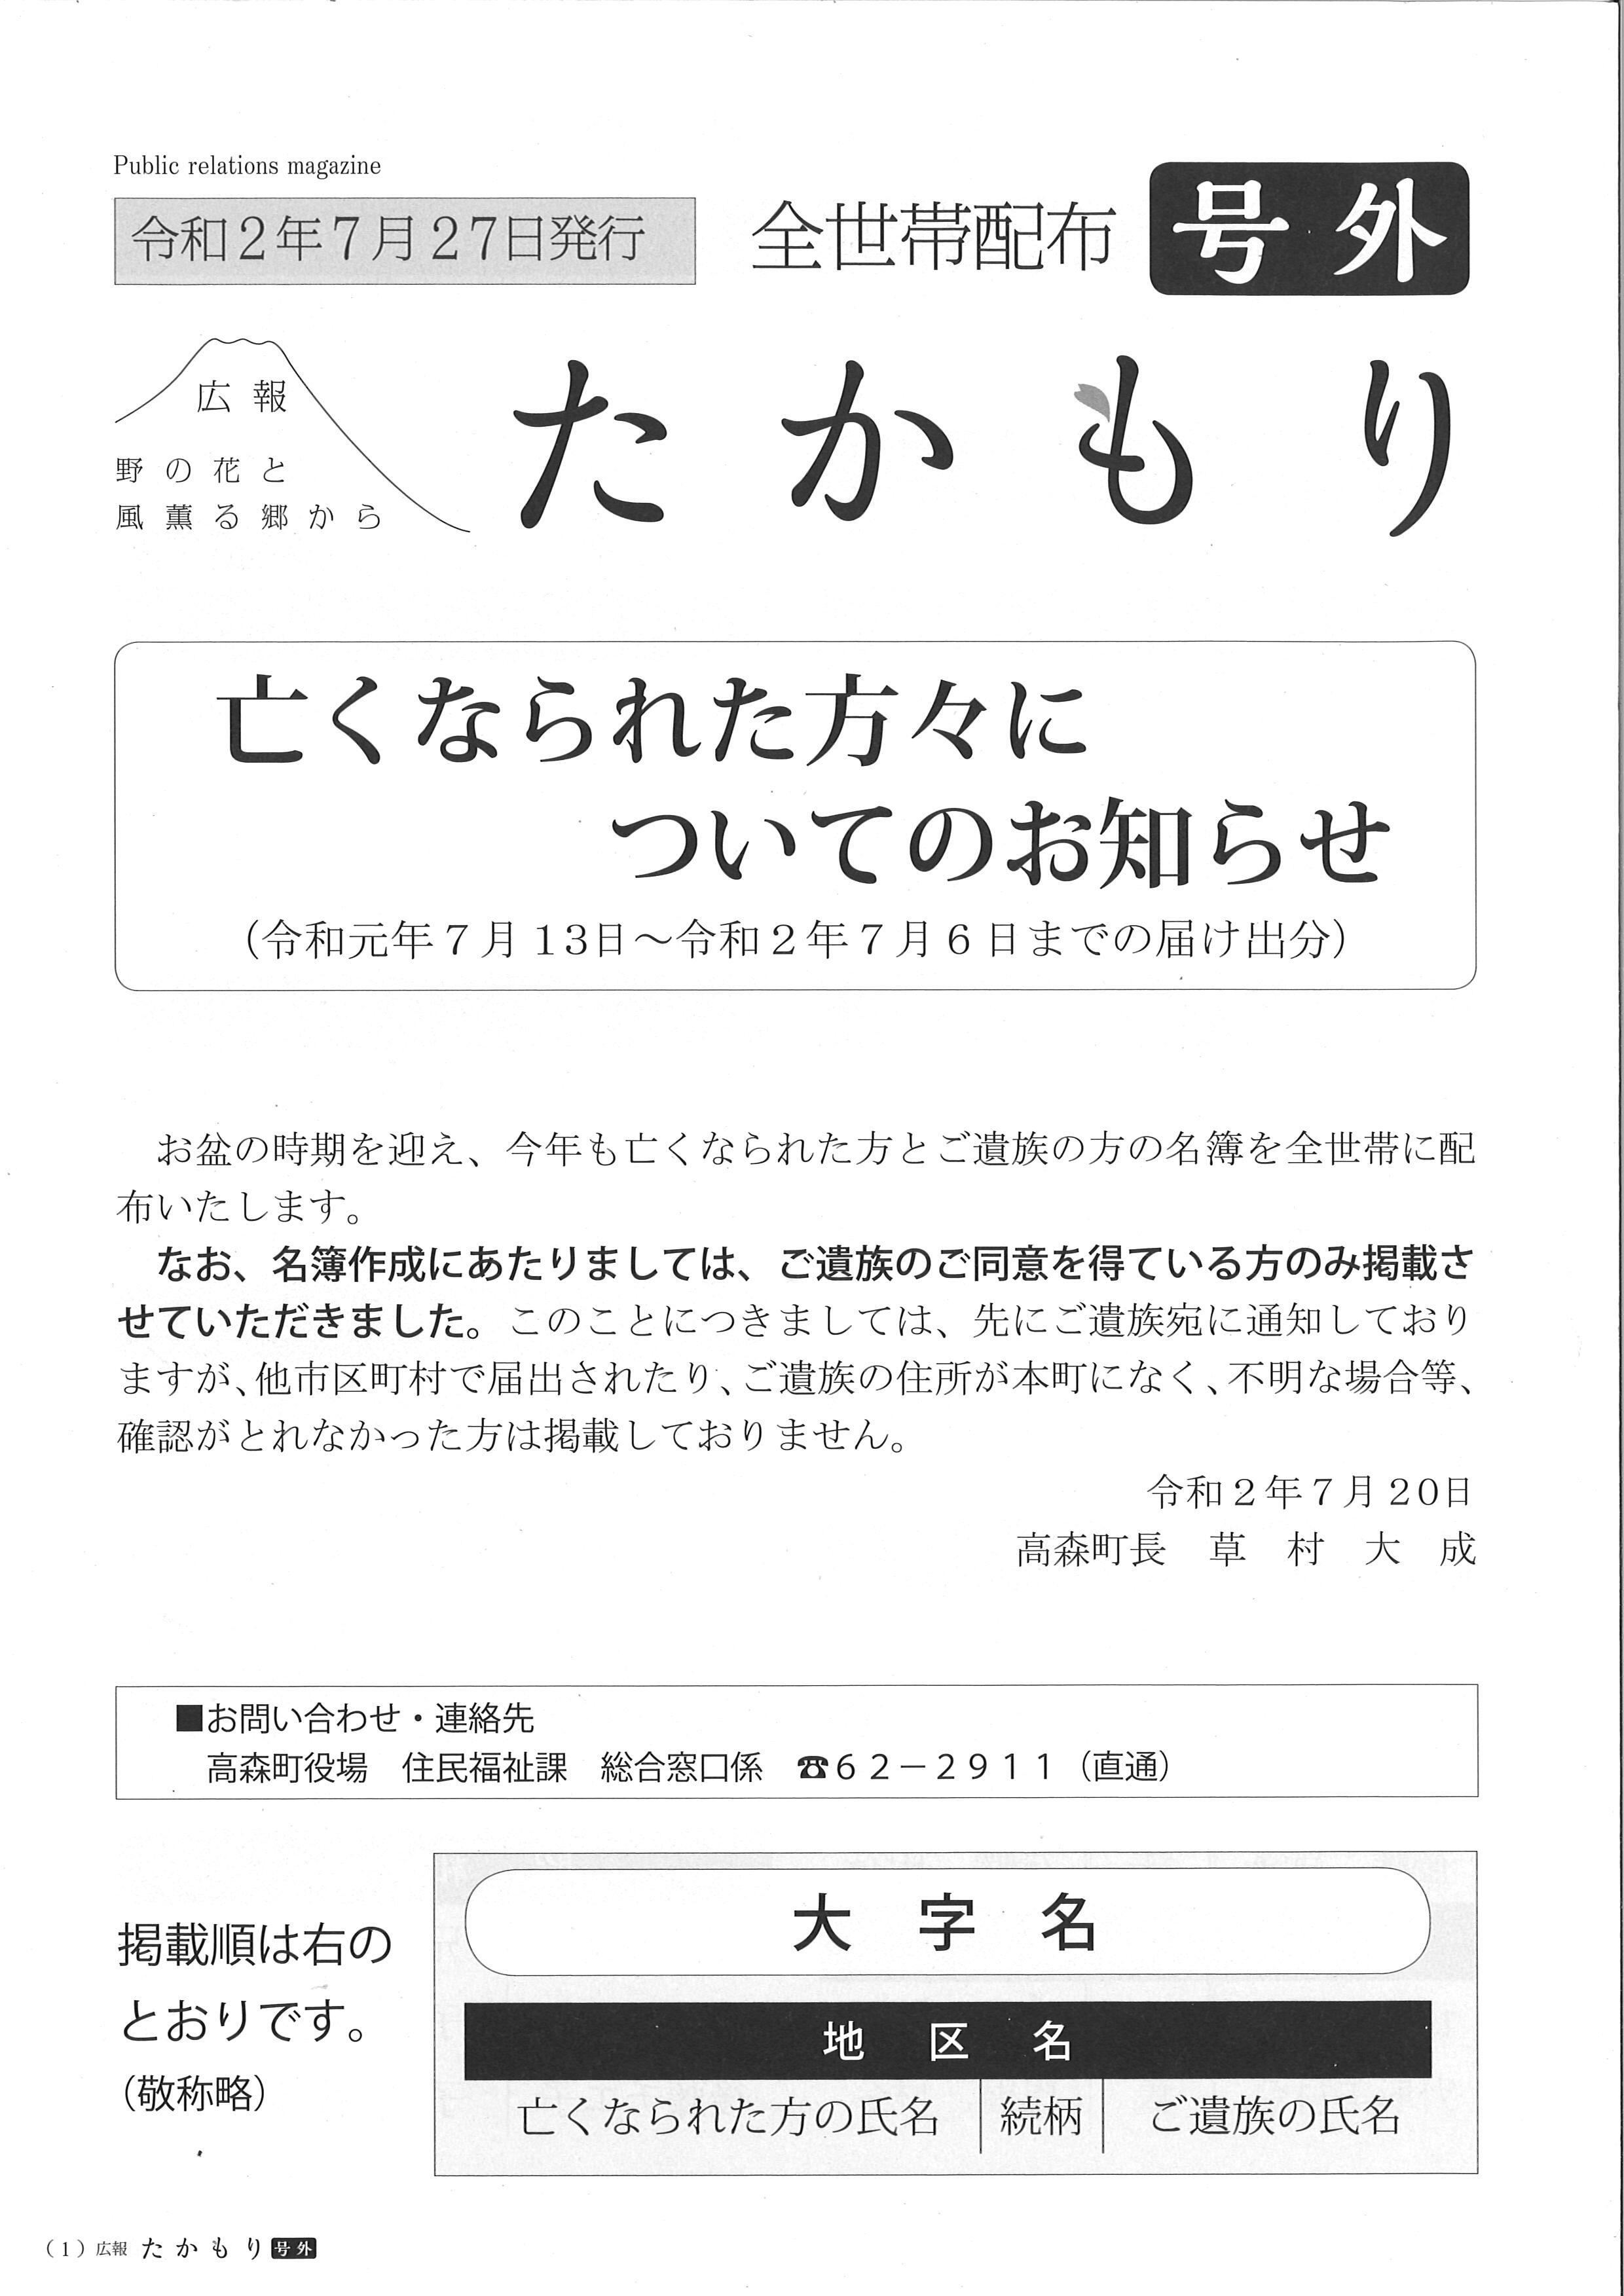 http://www.town.takamori.kumamoto.jp/chosha/somu/upload/f1c77f9afd90acadbe4f3cf6408e5b9aba53b015.jpg